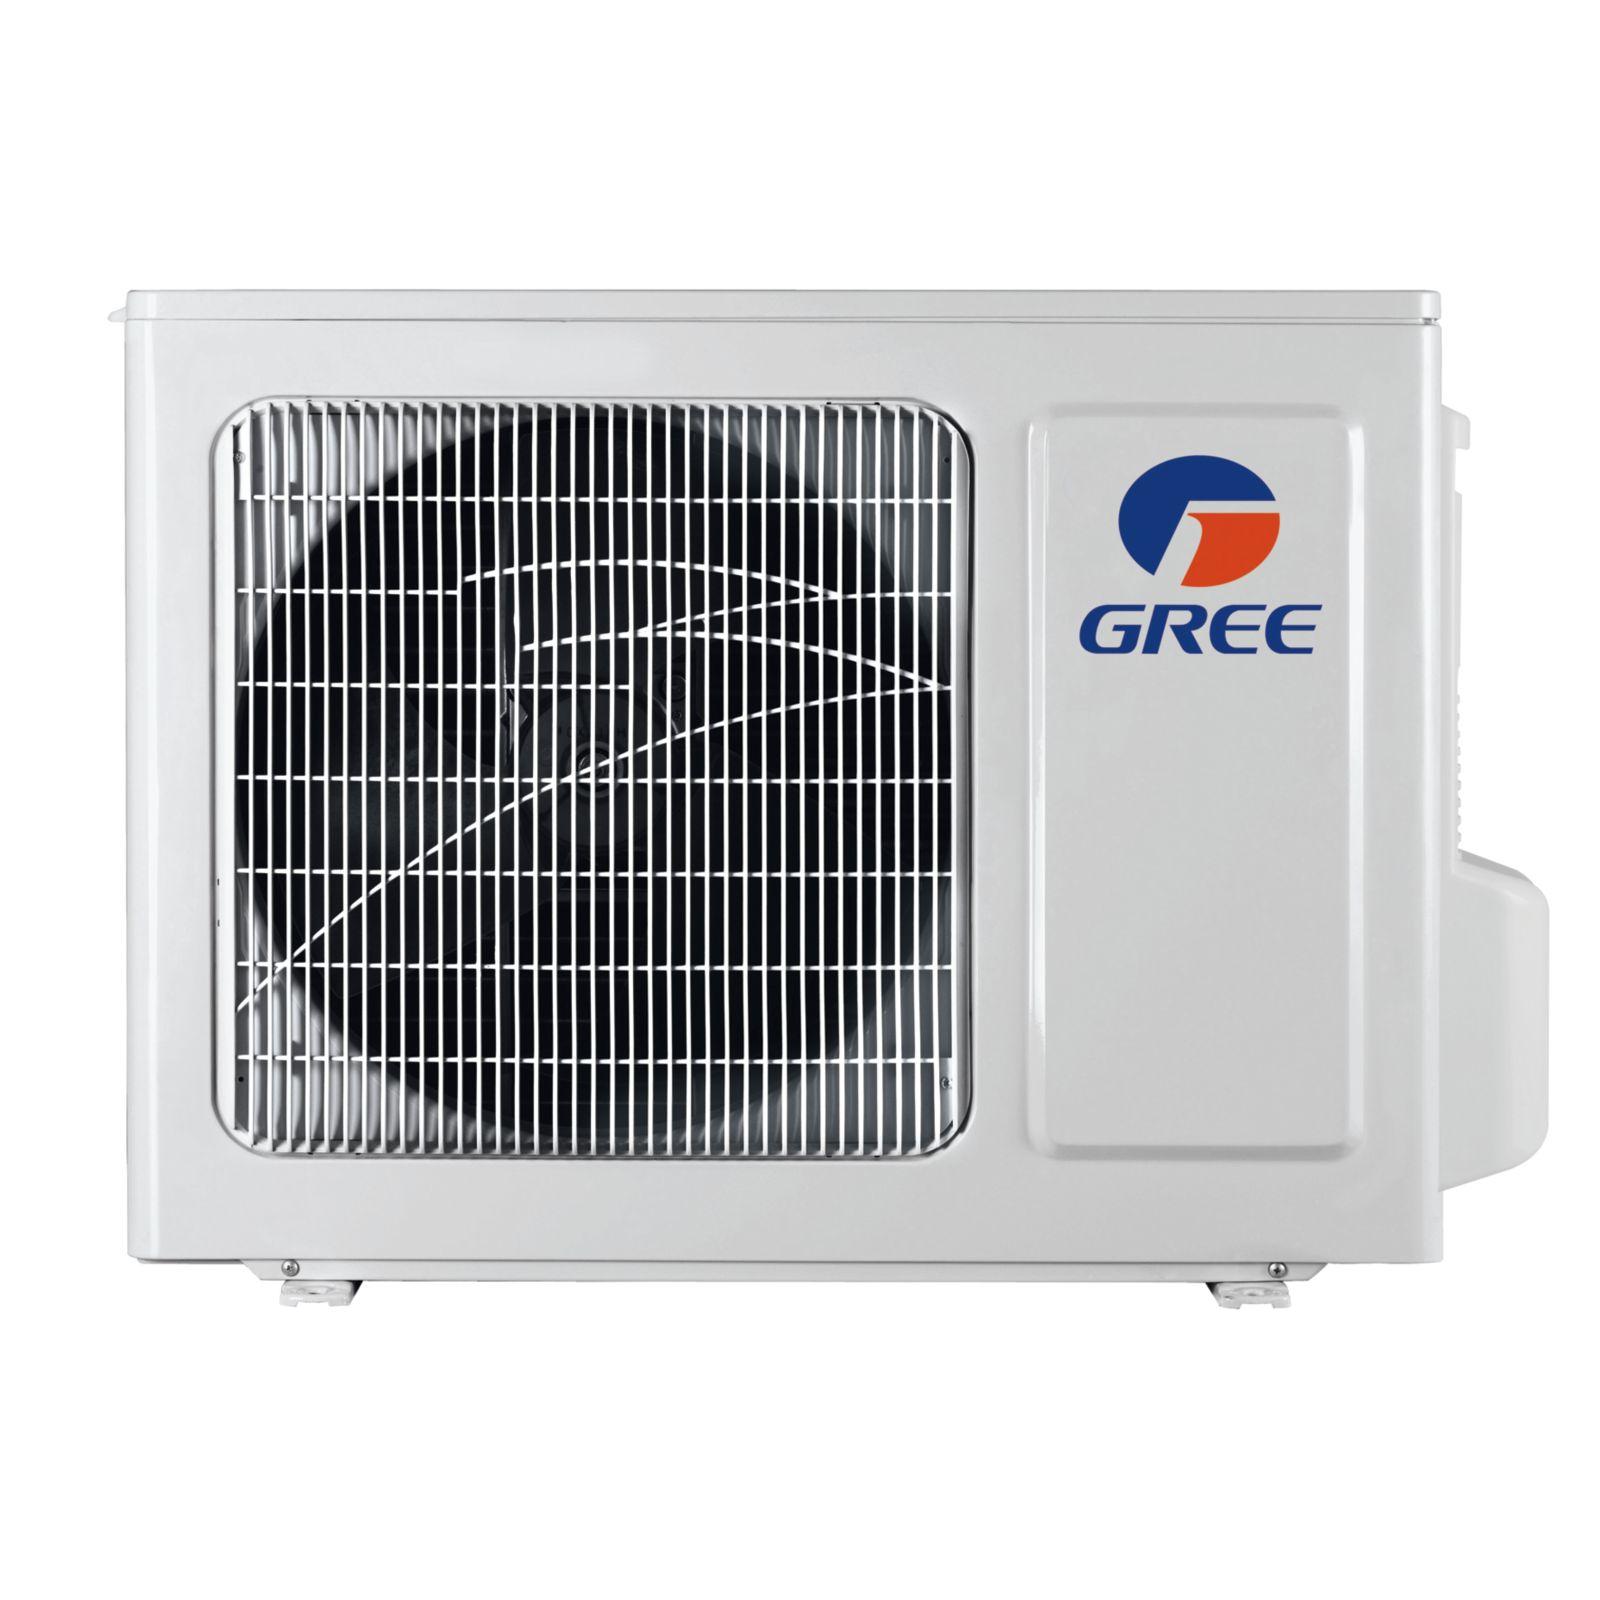 GREE Vireo+ WiFi 12k BTU 22SEER HP Outdoor Unit 115V